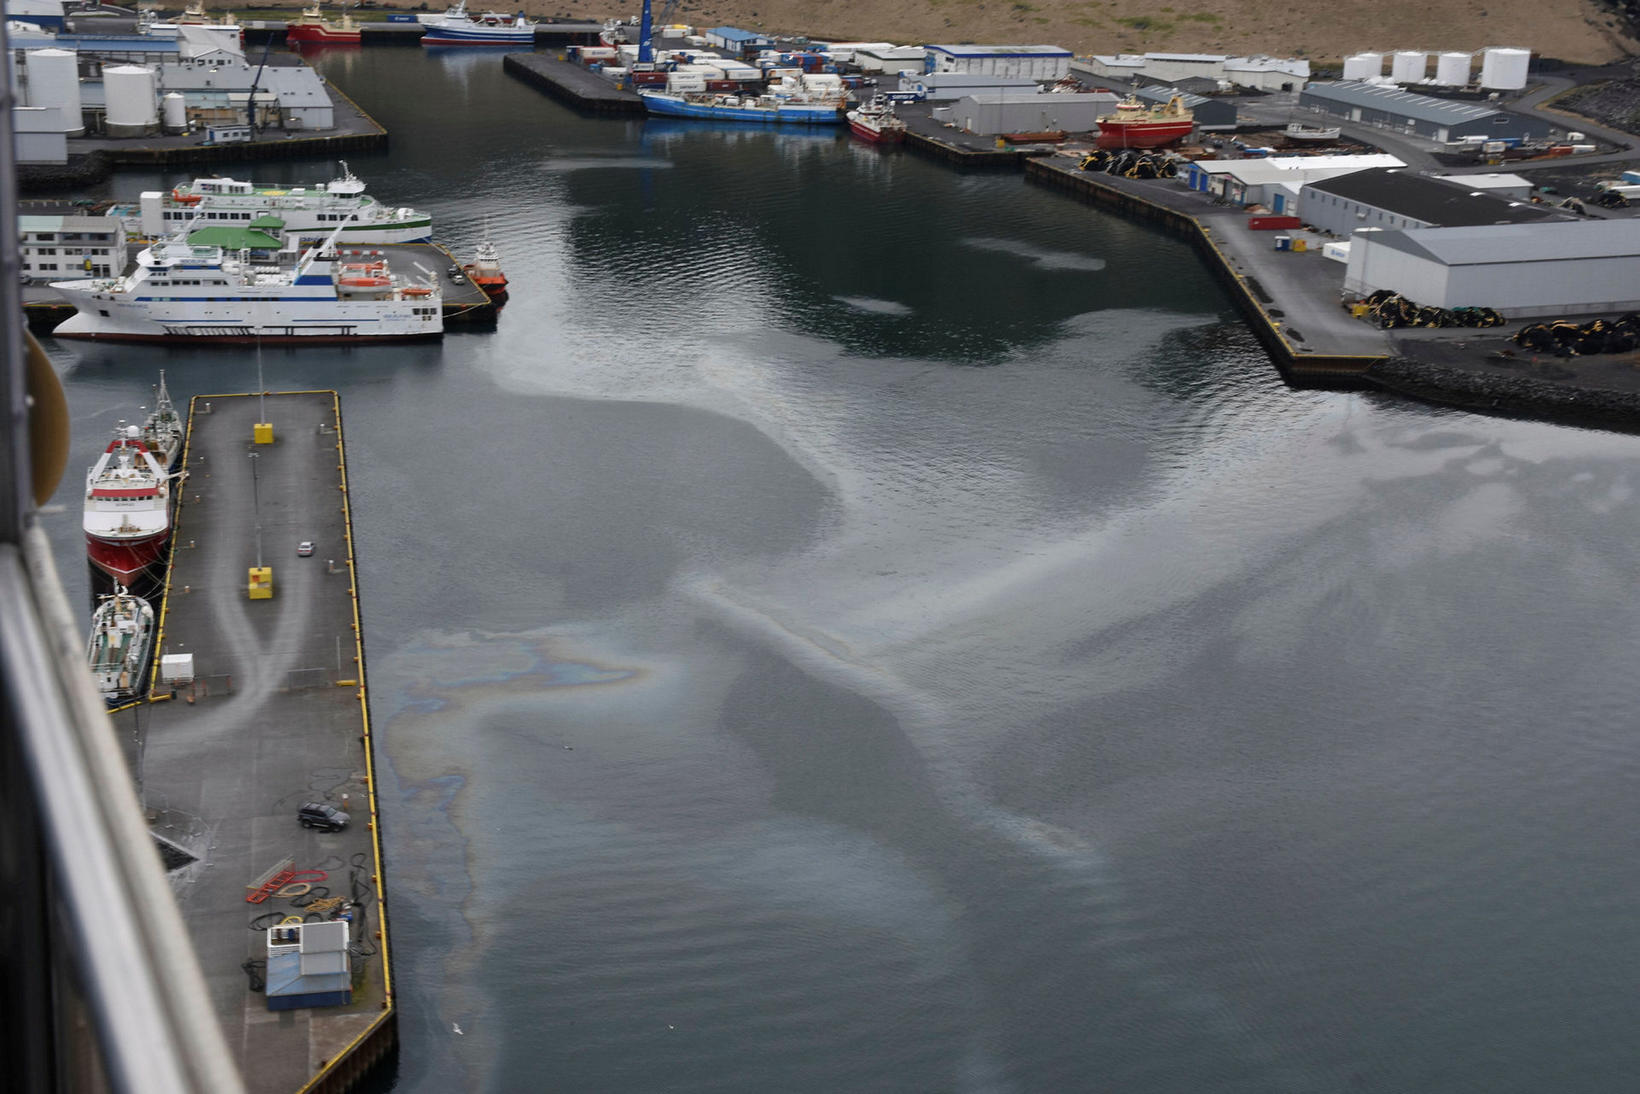 Vestmannaeyjar harbor. The oil slick is obvious.